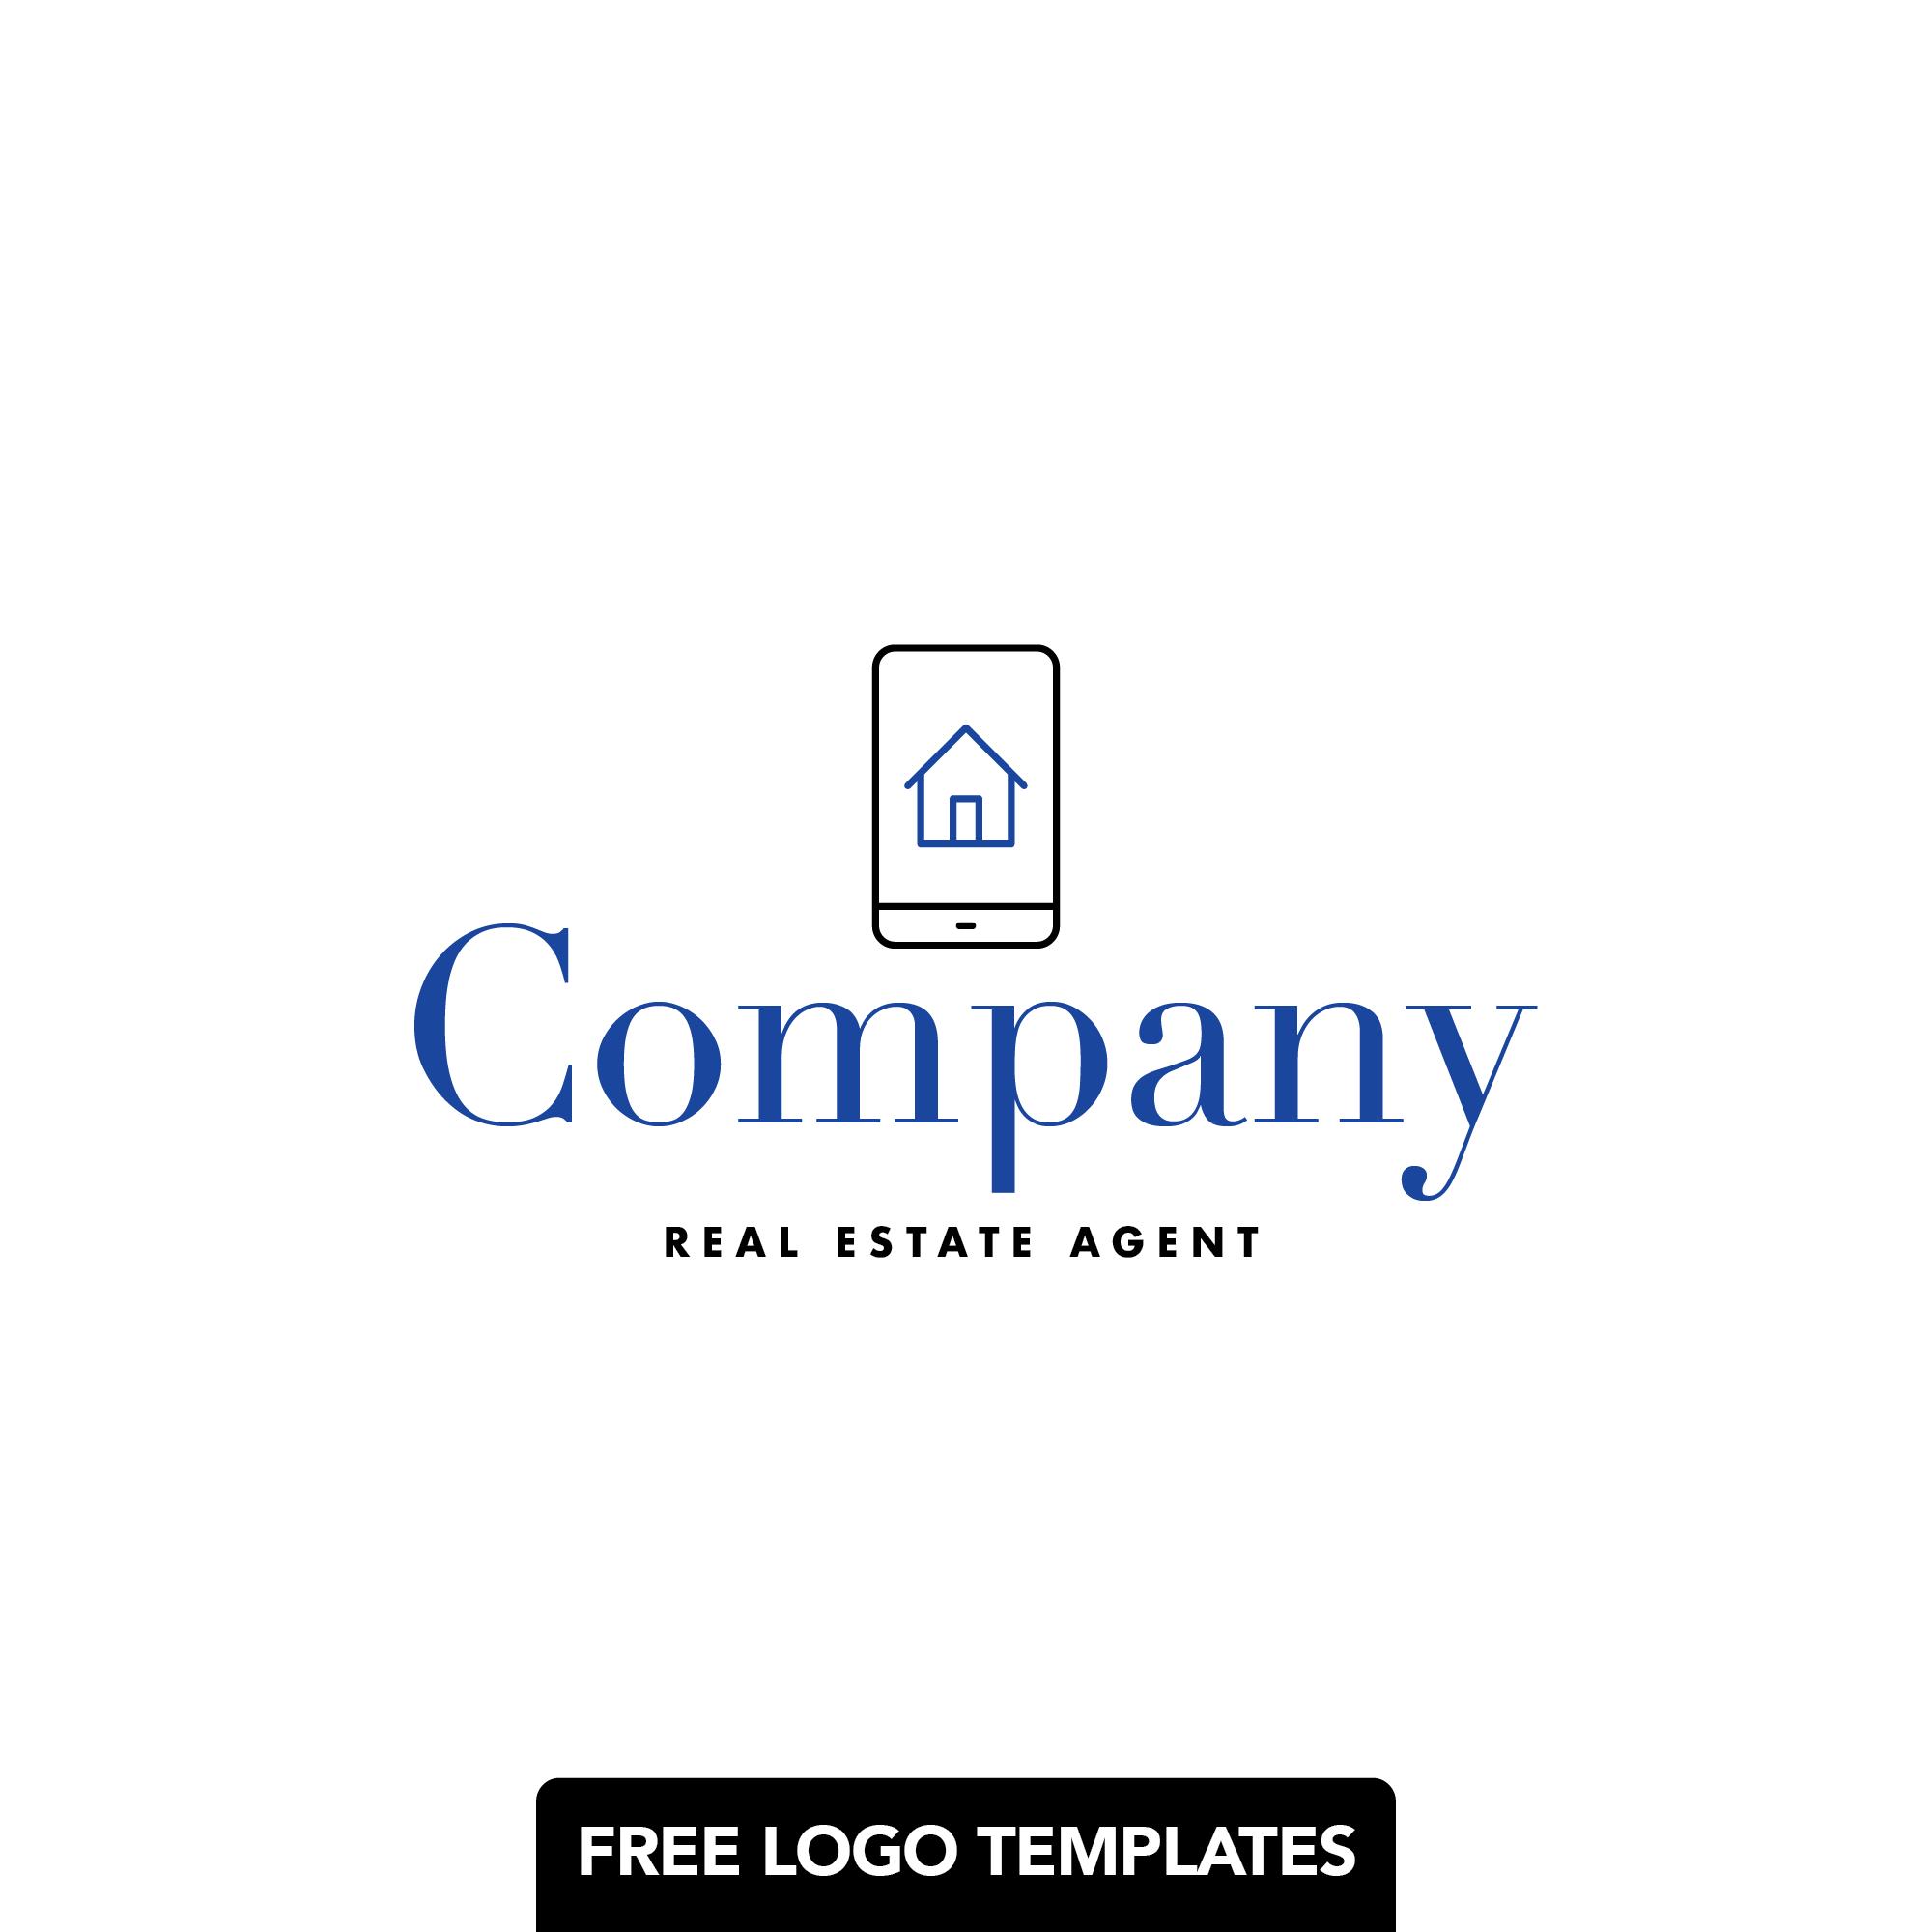 Free Logo Templates: Real Estate Readymade Template | Photoshop (PSD) and Illustrator (AI) Files Provided